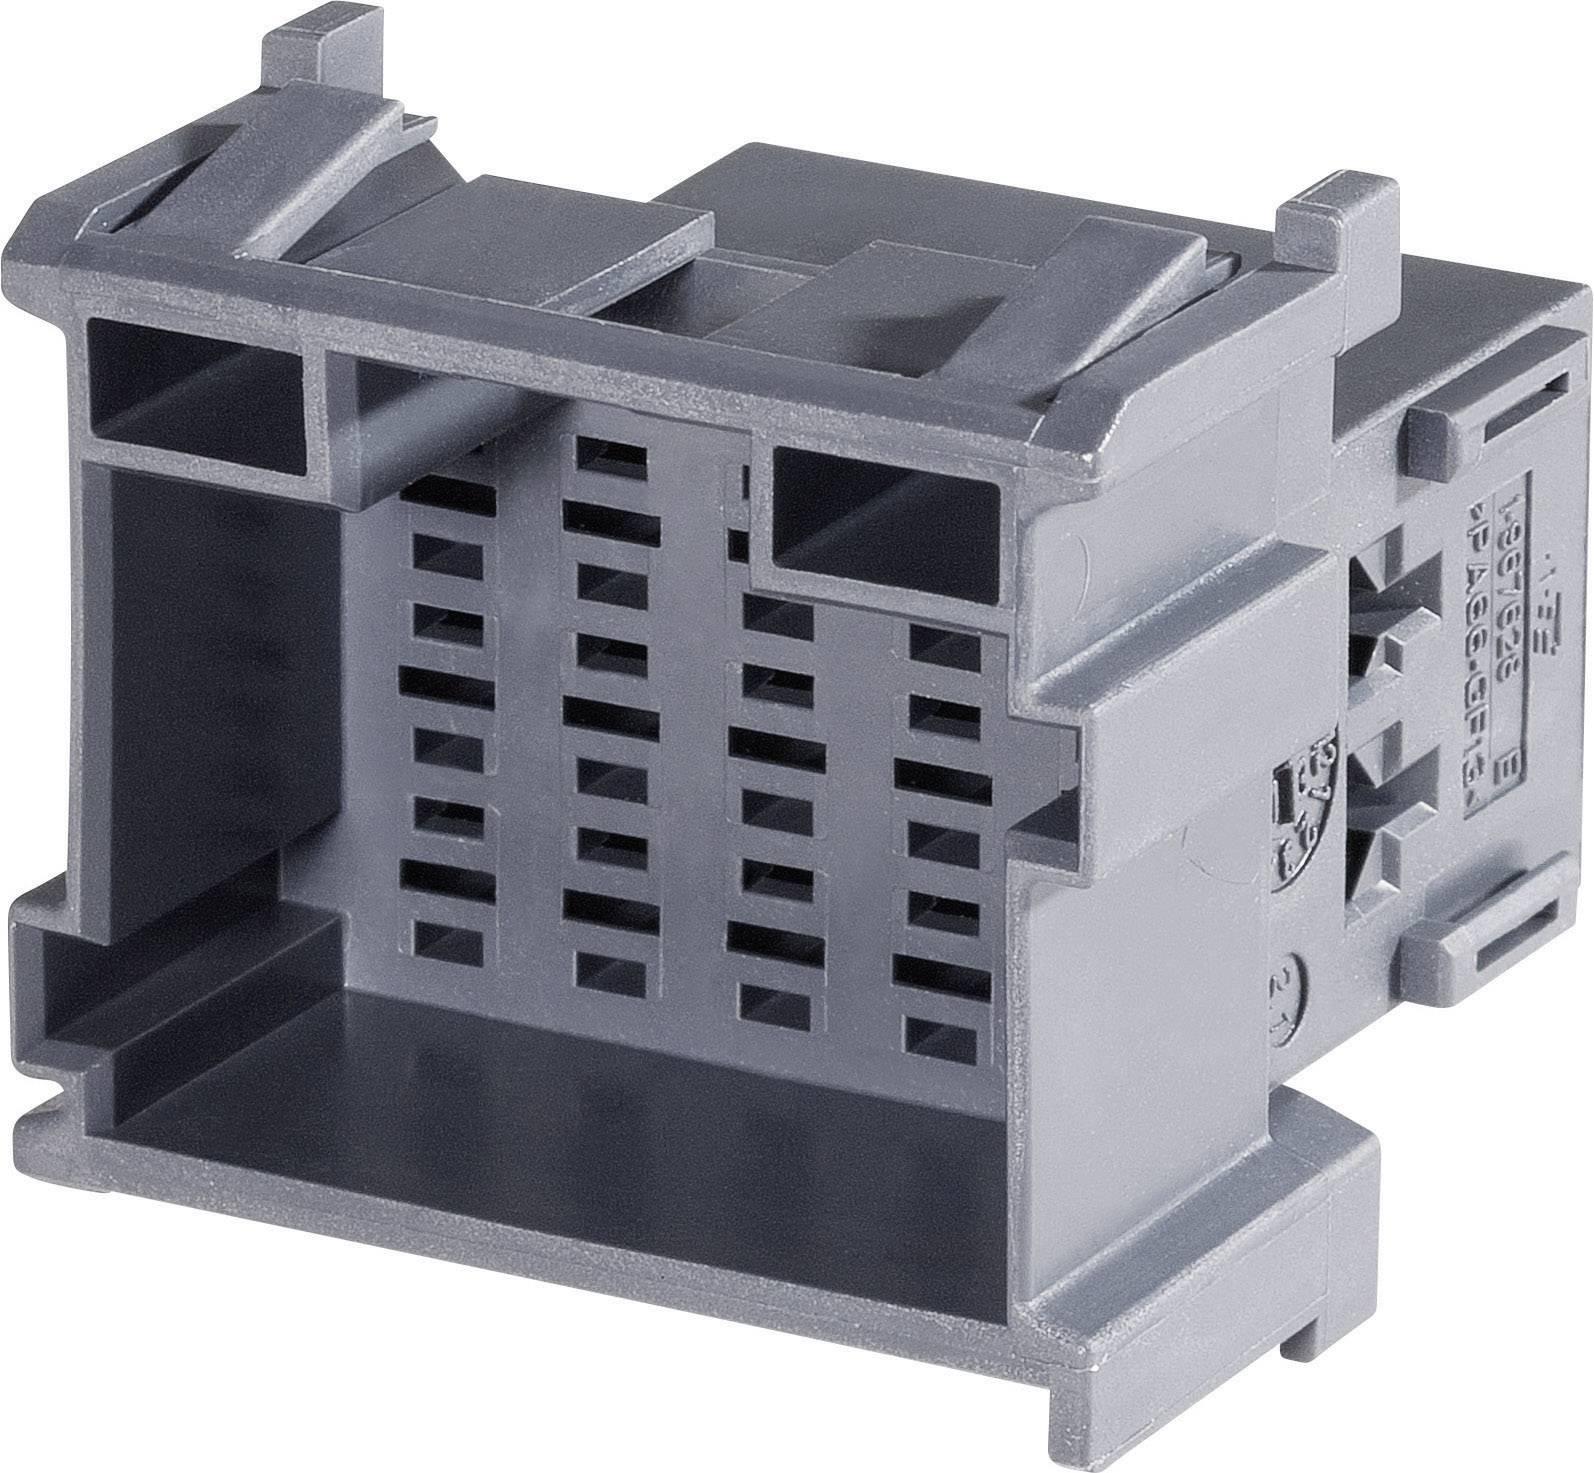 Zásuvkové púzdro na kábel TE Connectivity J-P-T 1-967628-6, 35.5 mm, pólů 15, rozteč 5 mm, 1 ks